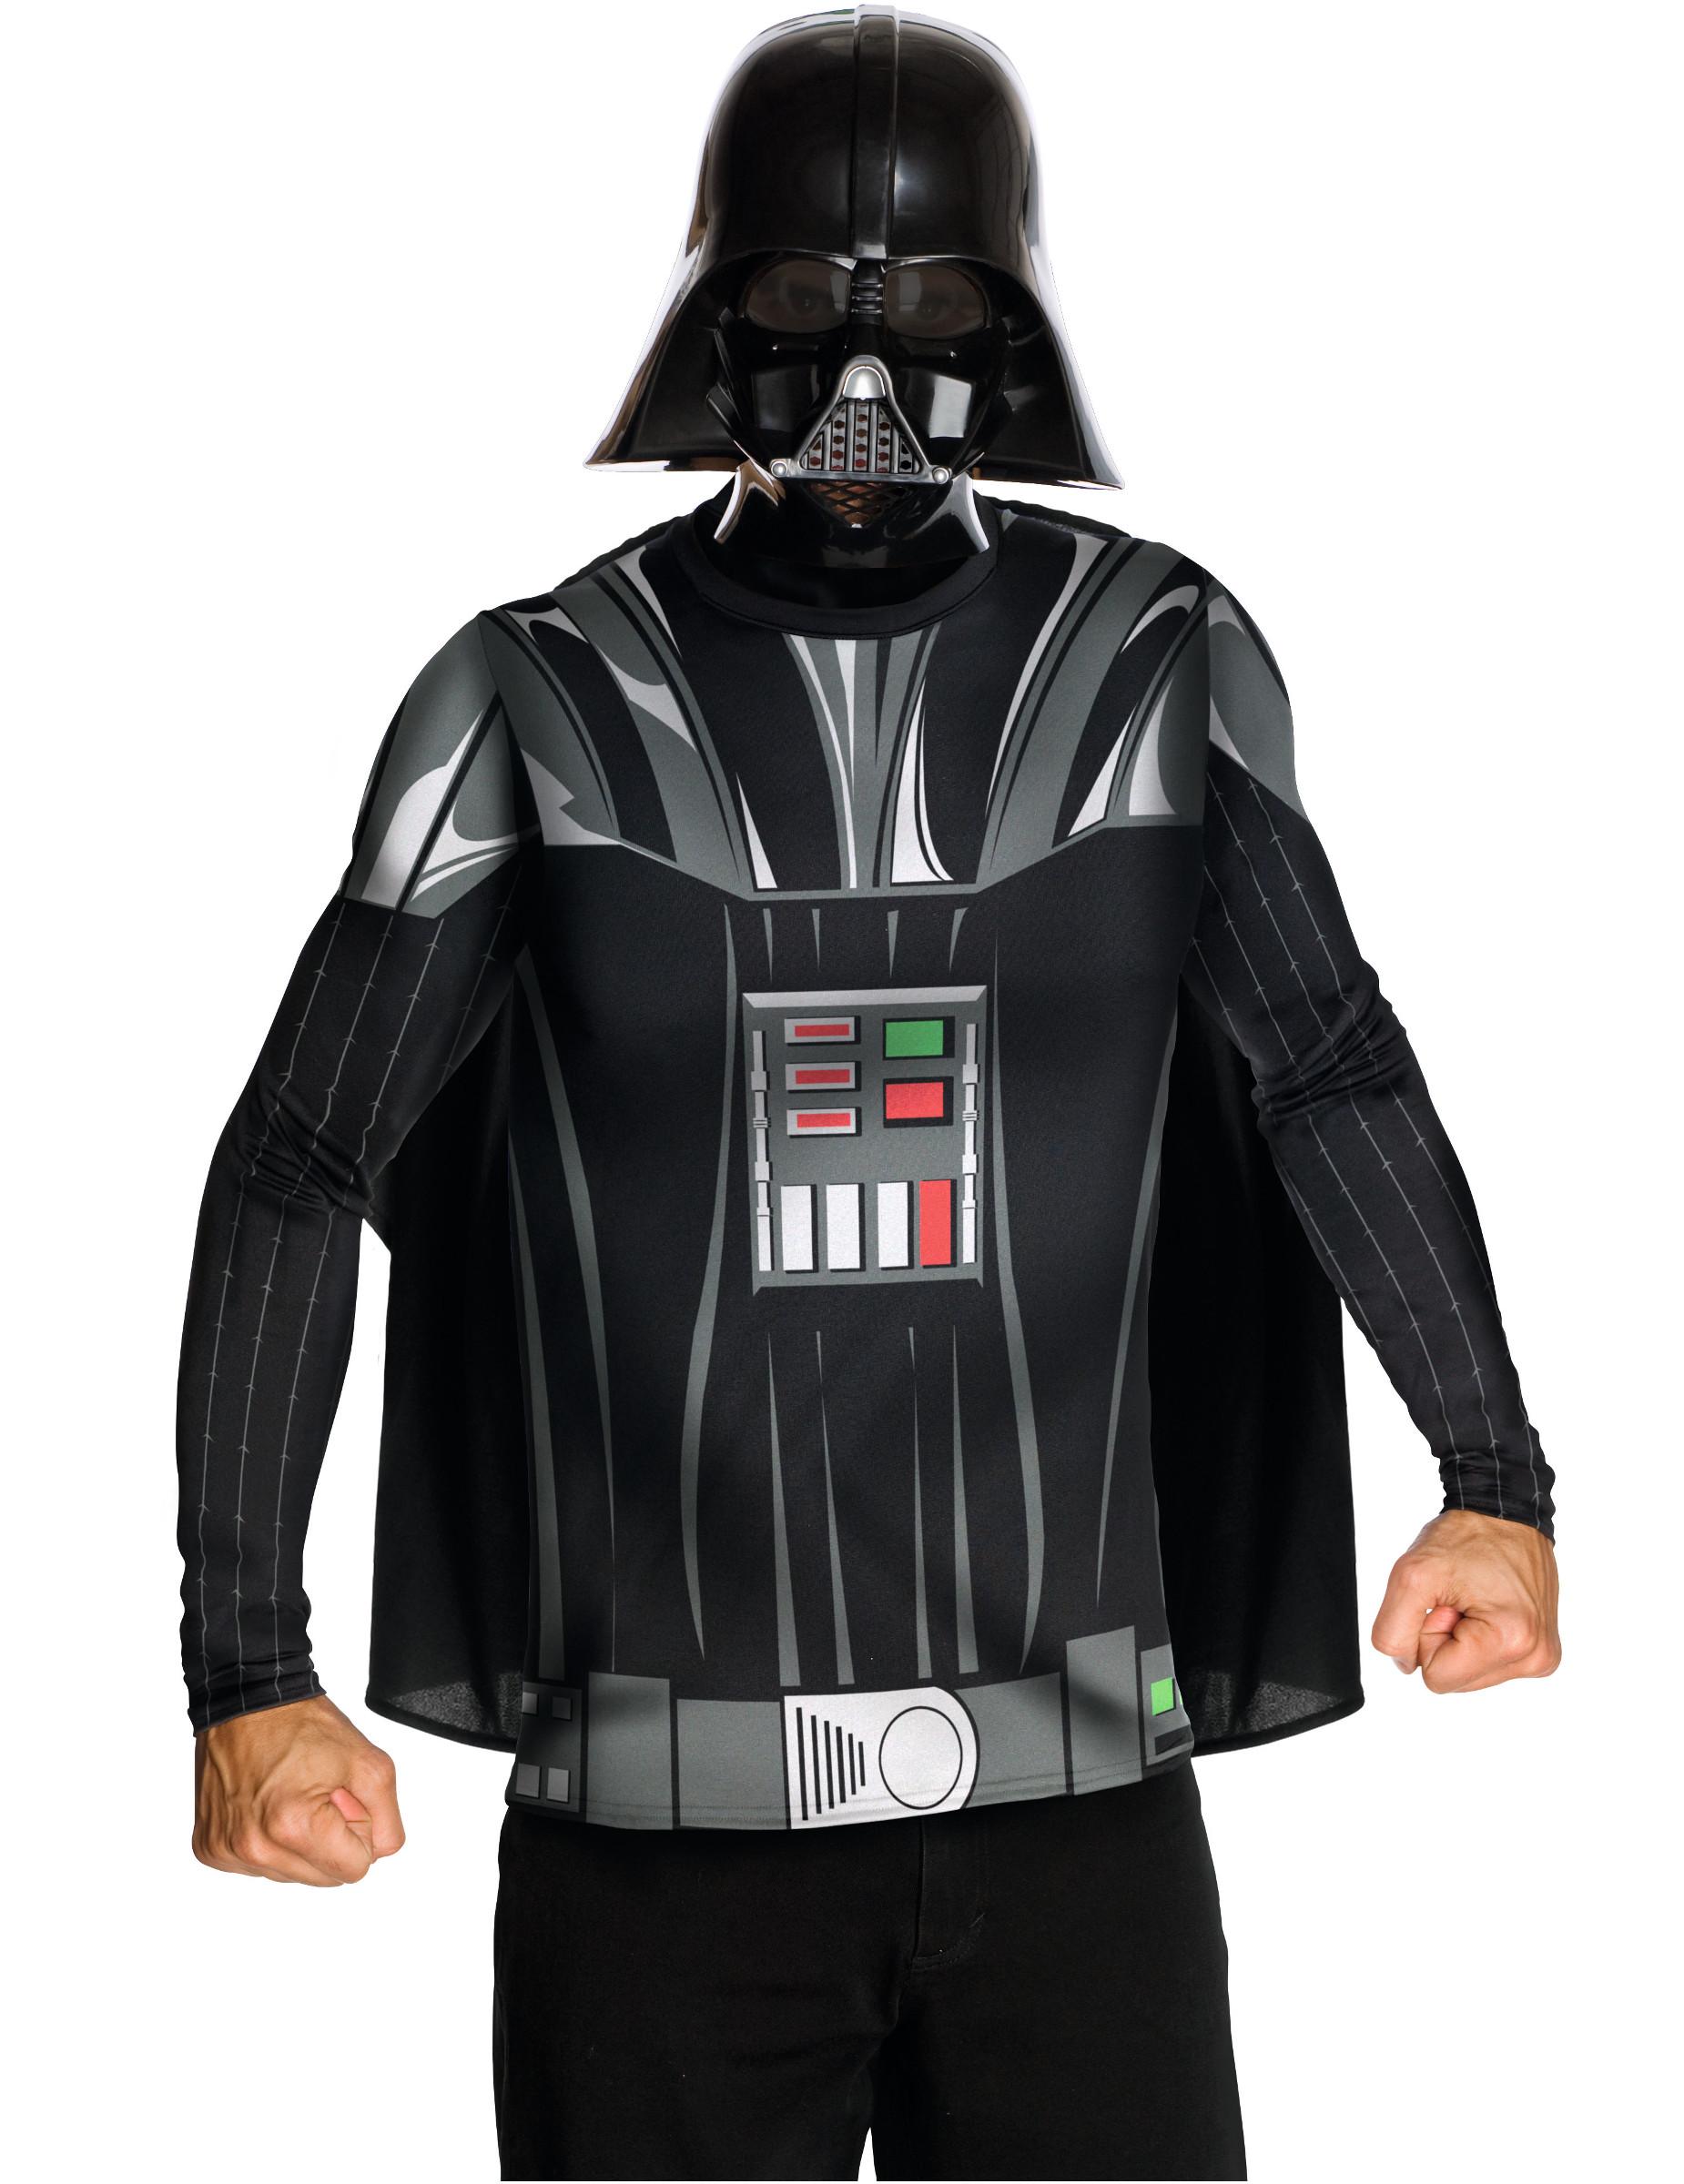 T shirt avec cape et masque dark vador adulte deguise - Image dark vador ...